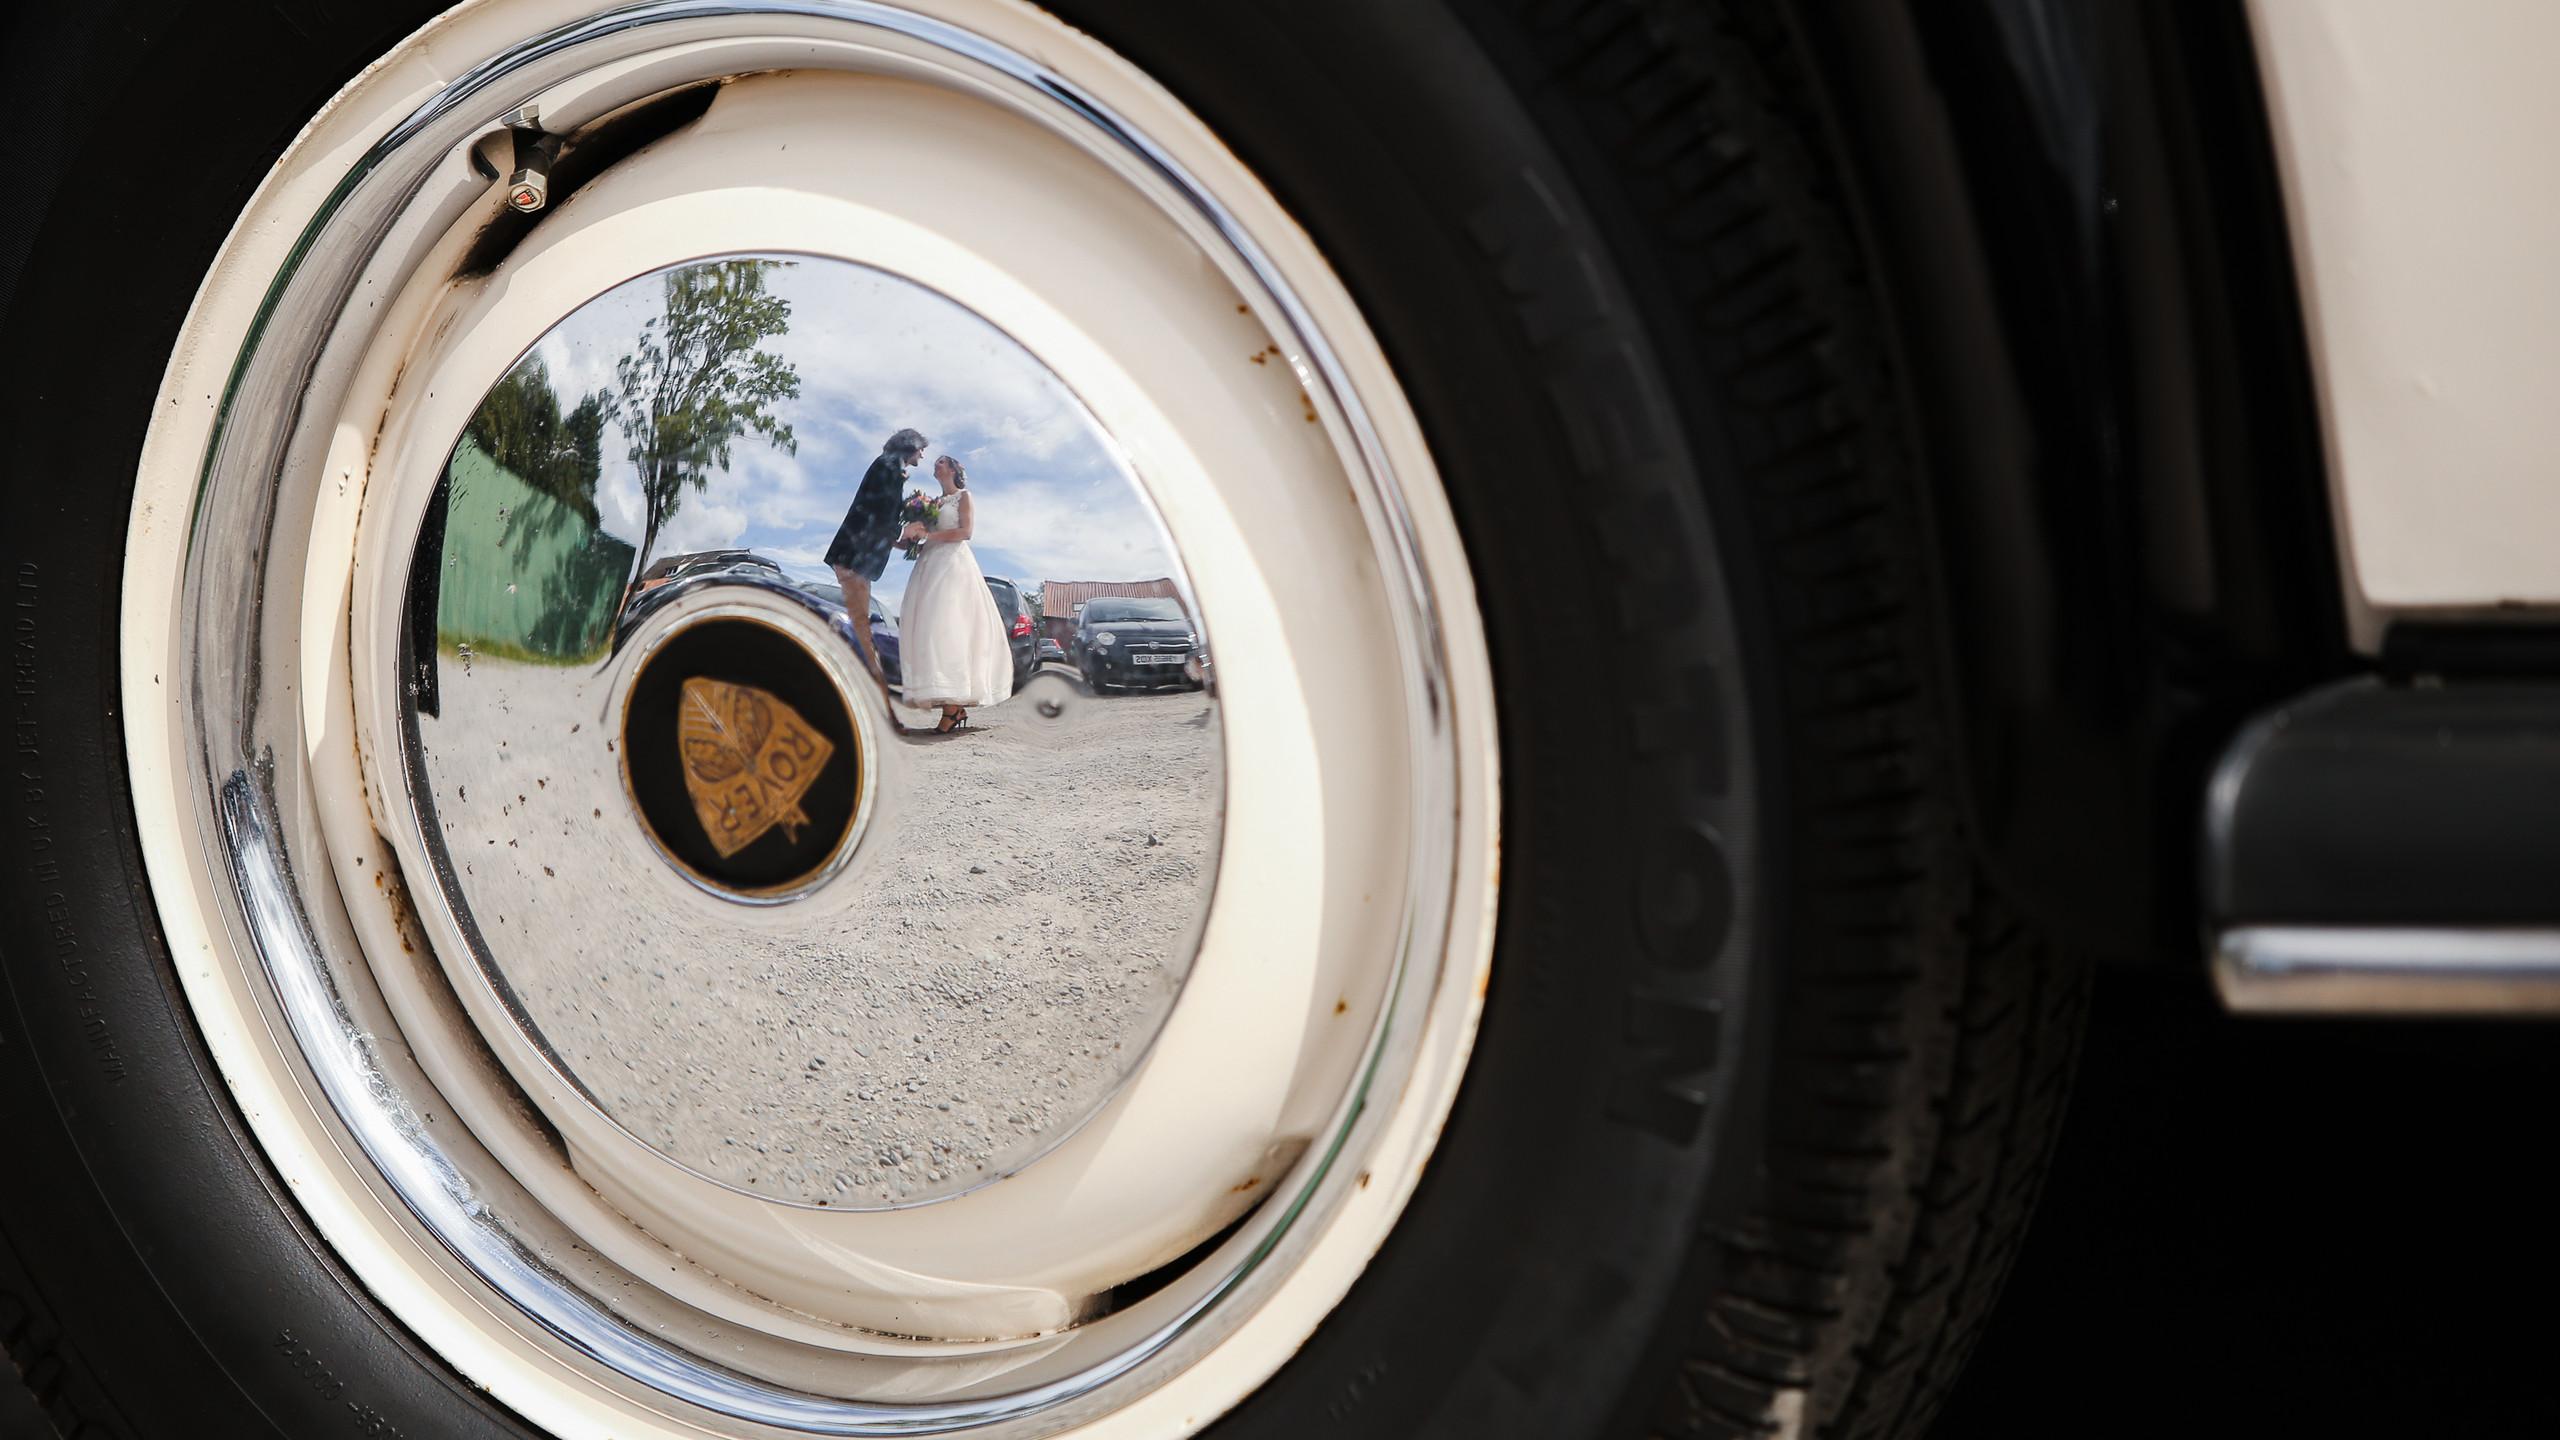 Reflection in Rover wheel cap